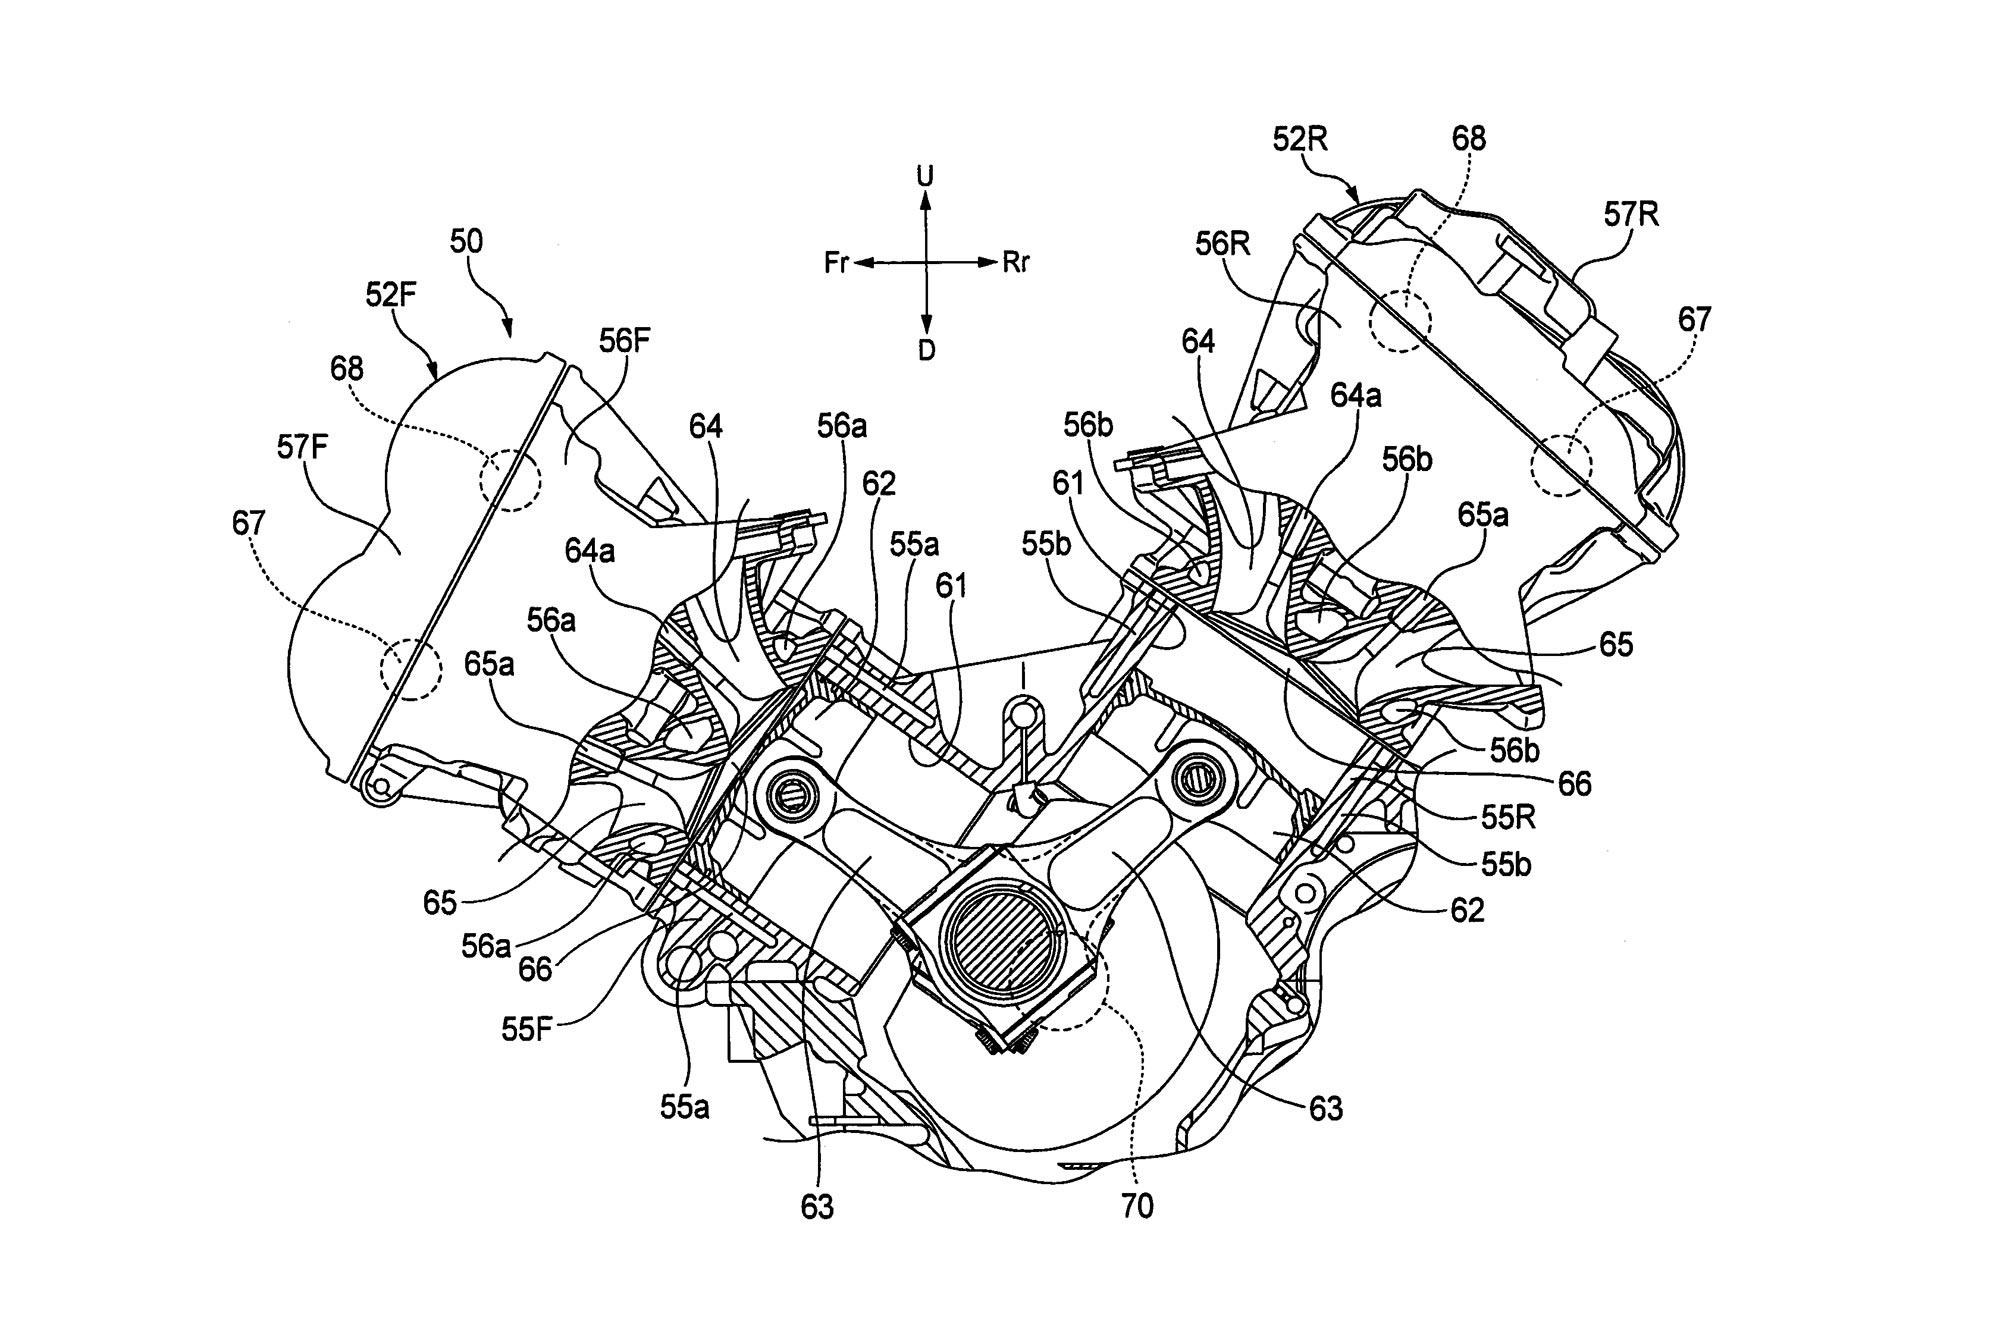 ducati engine diagrams honda v4 superbike engine outed in patent photos asphalt   rubber  honda v4 superbike engine outed in